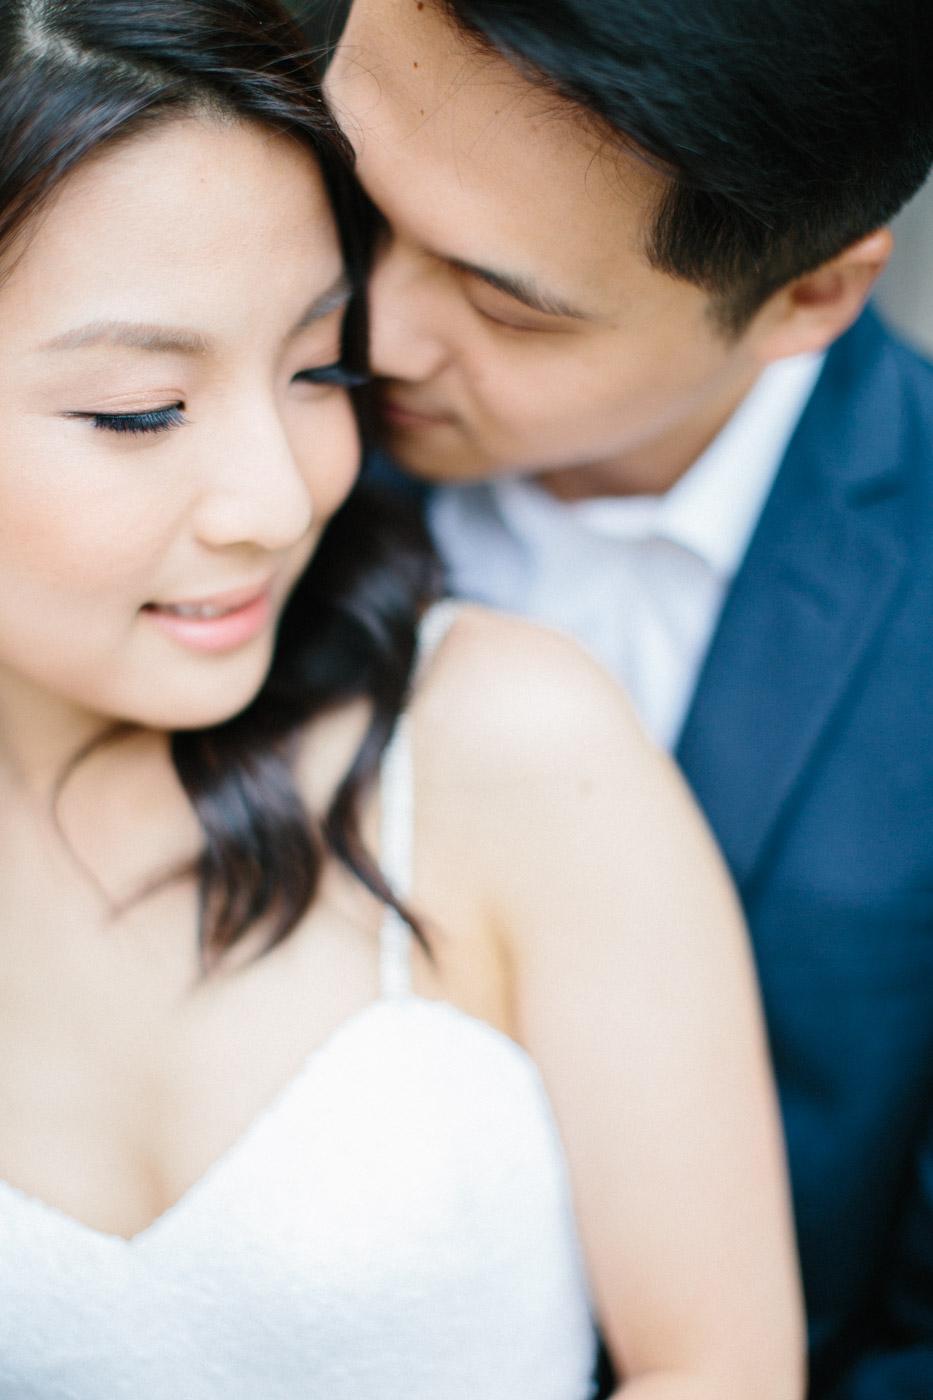 toronto_wedding_photographer_fine_art_documentary 2017-75.jpg